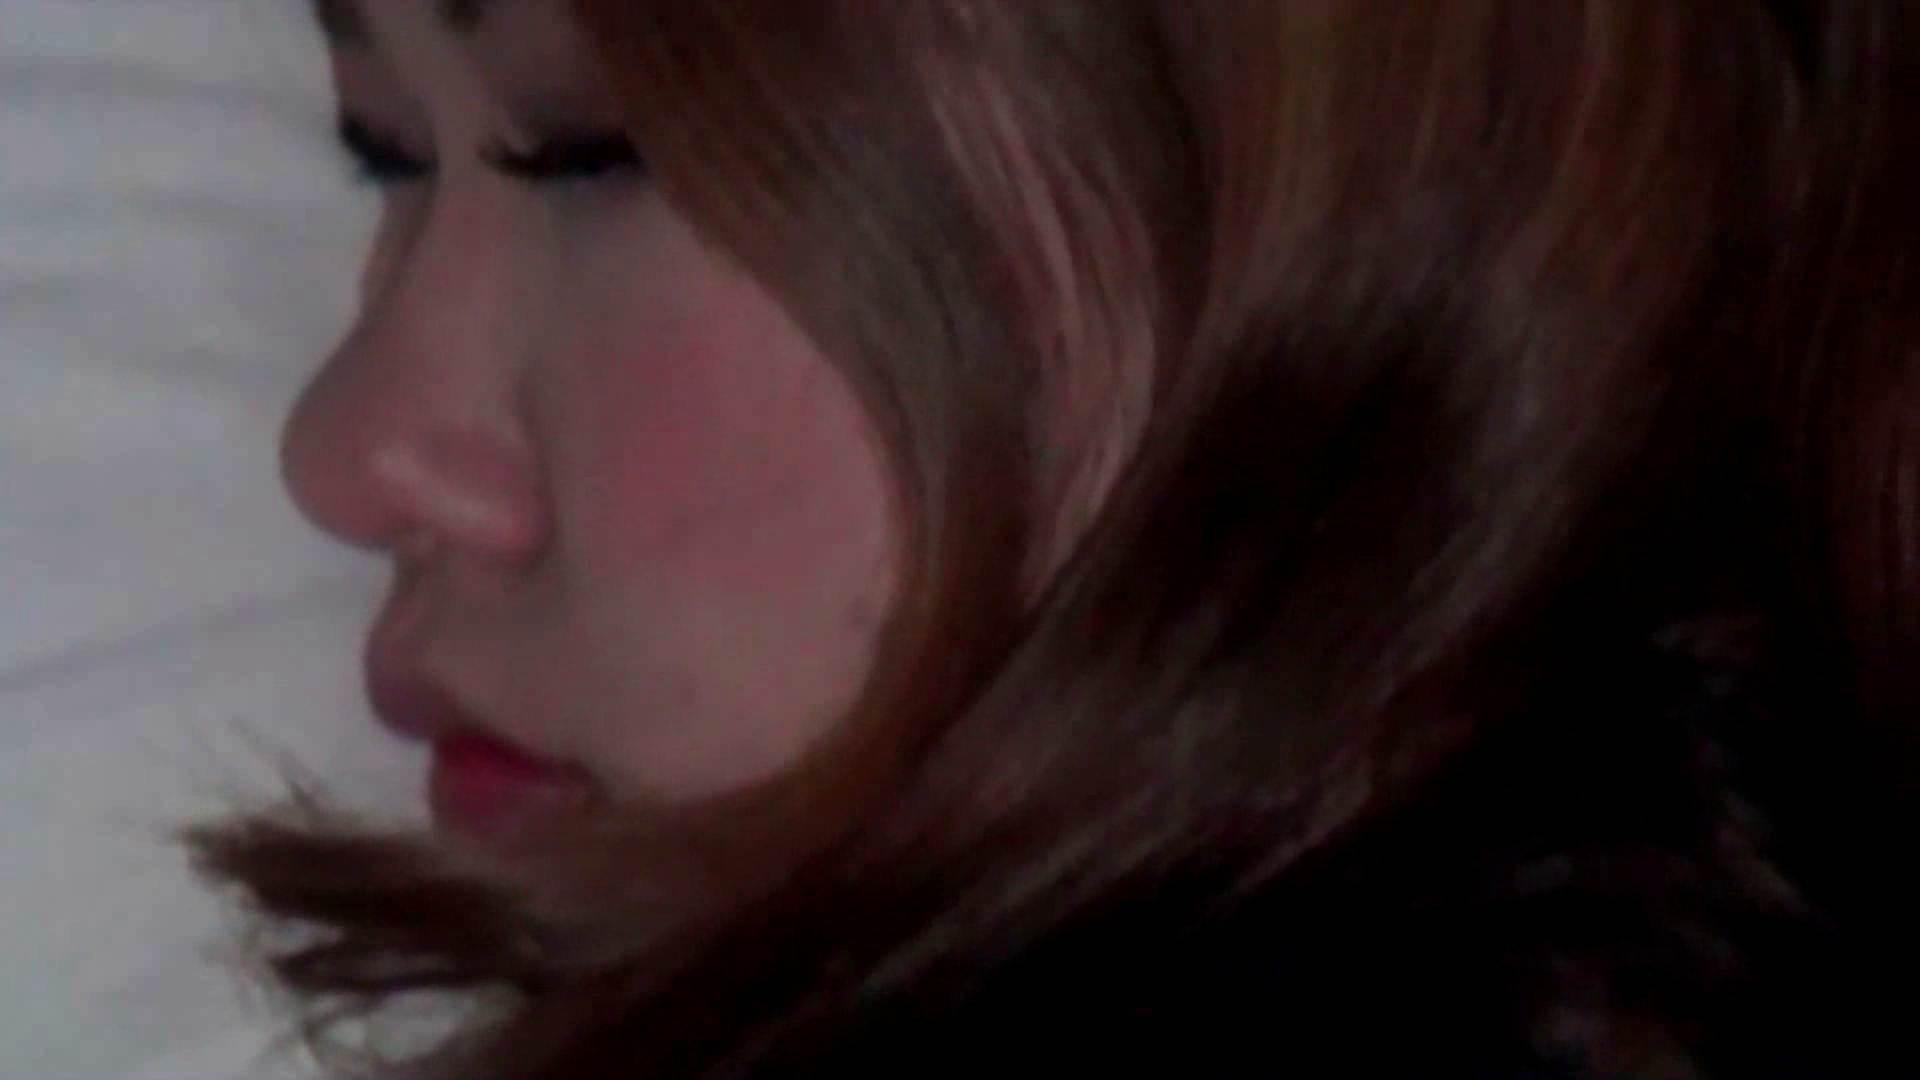 vol.33 【H・Kちゃん】 セクシー系ギャル現役JD 1回目 丸見え  20pic 8